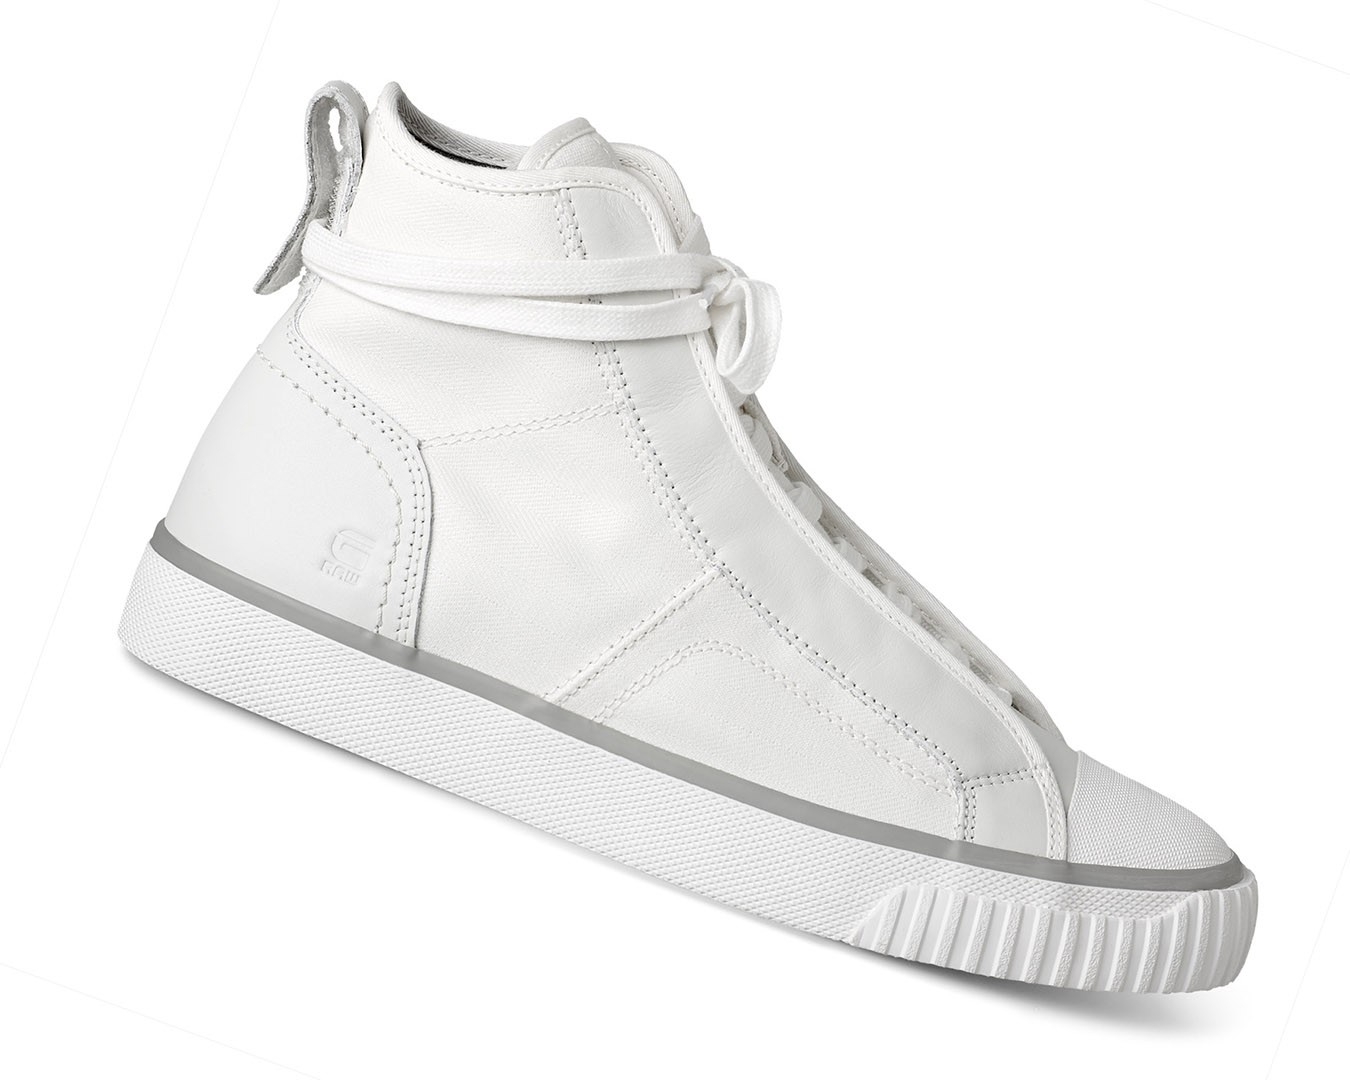 g star raw scuba weiss retro herren high top sneaker. Black Bedroom Furniture Sets. Home Design Ideas